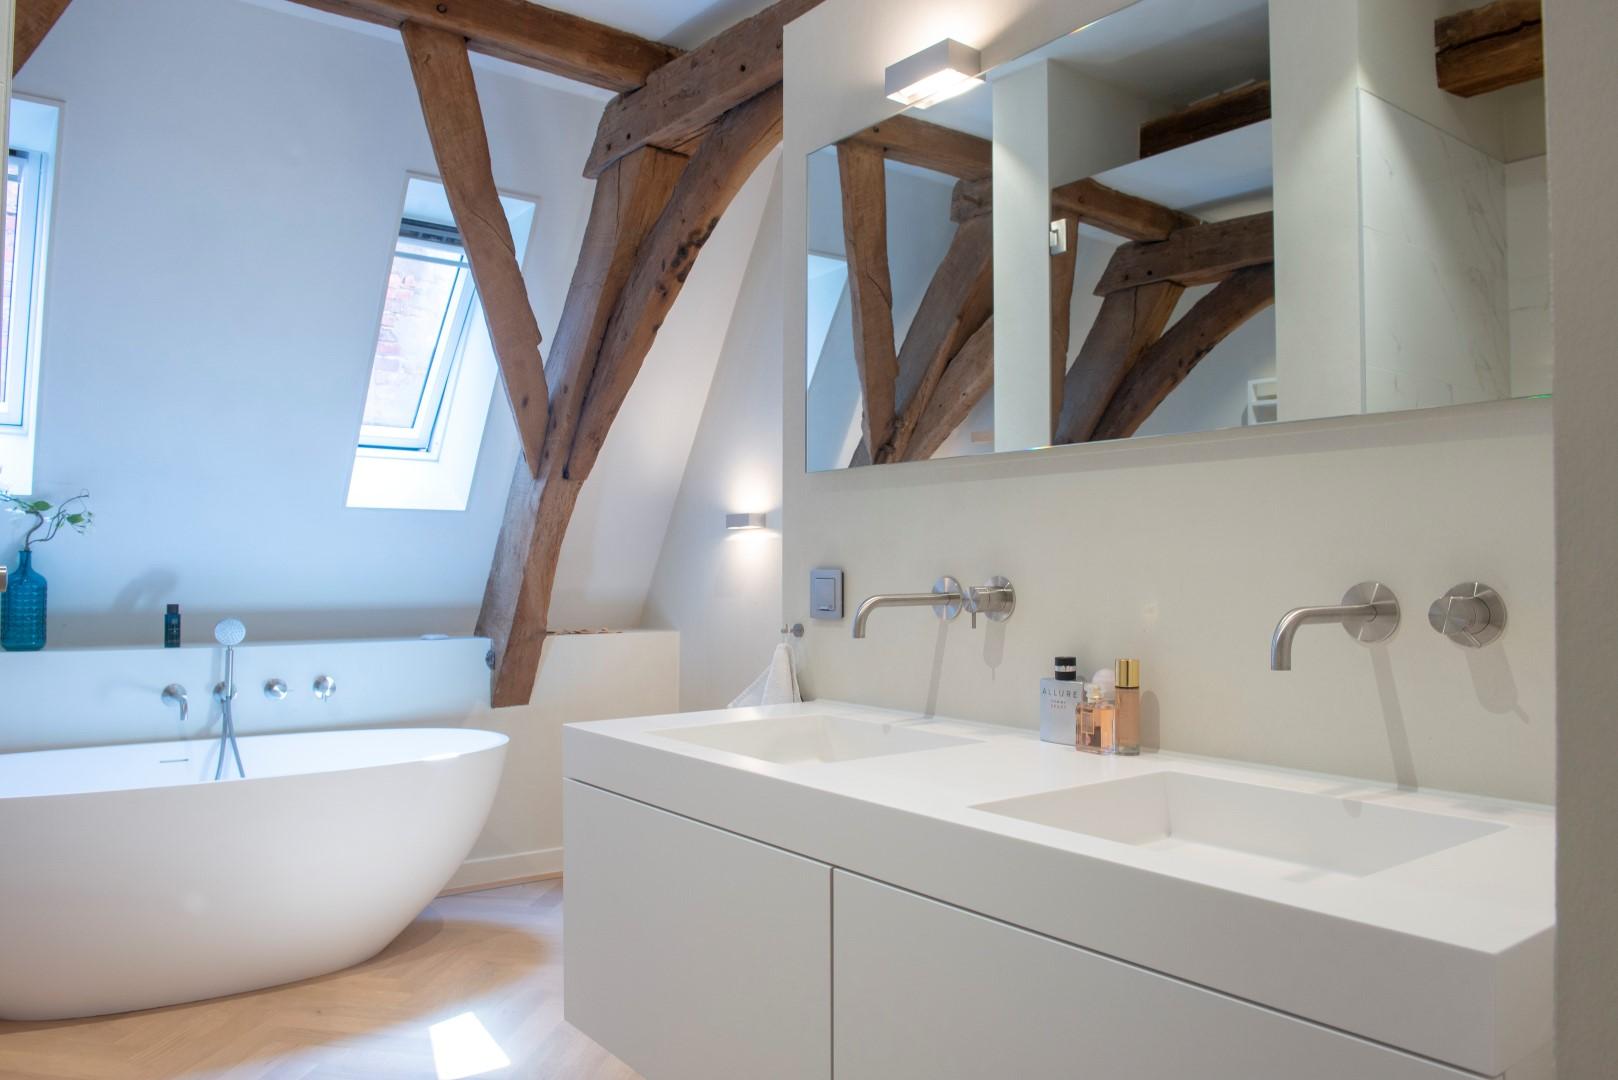 Badkamer in prachtig grachtenpand woonforum